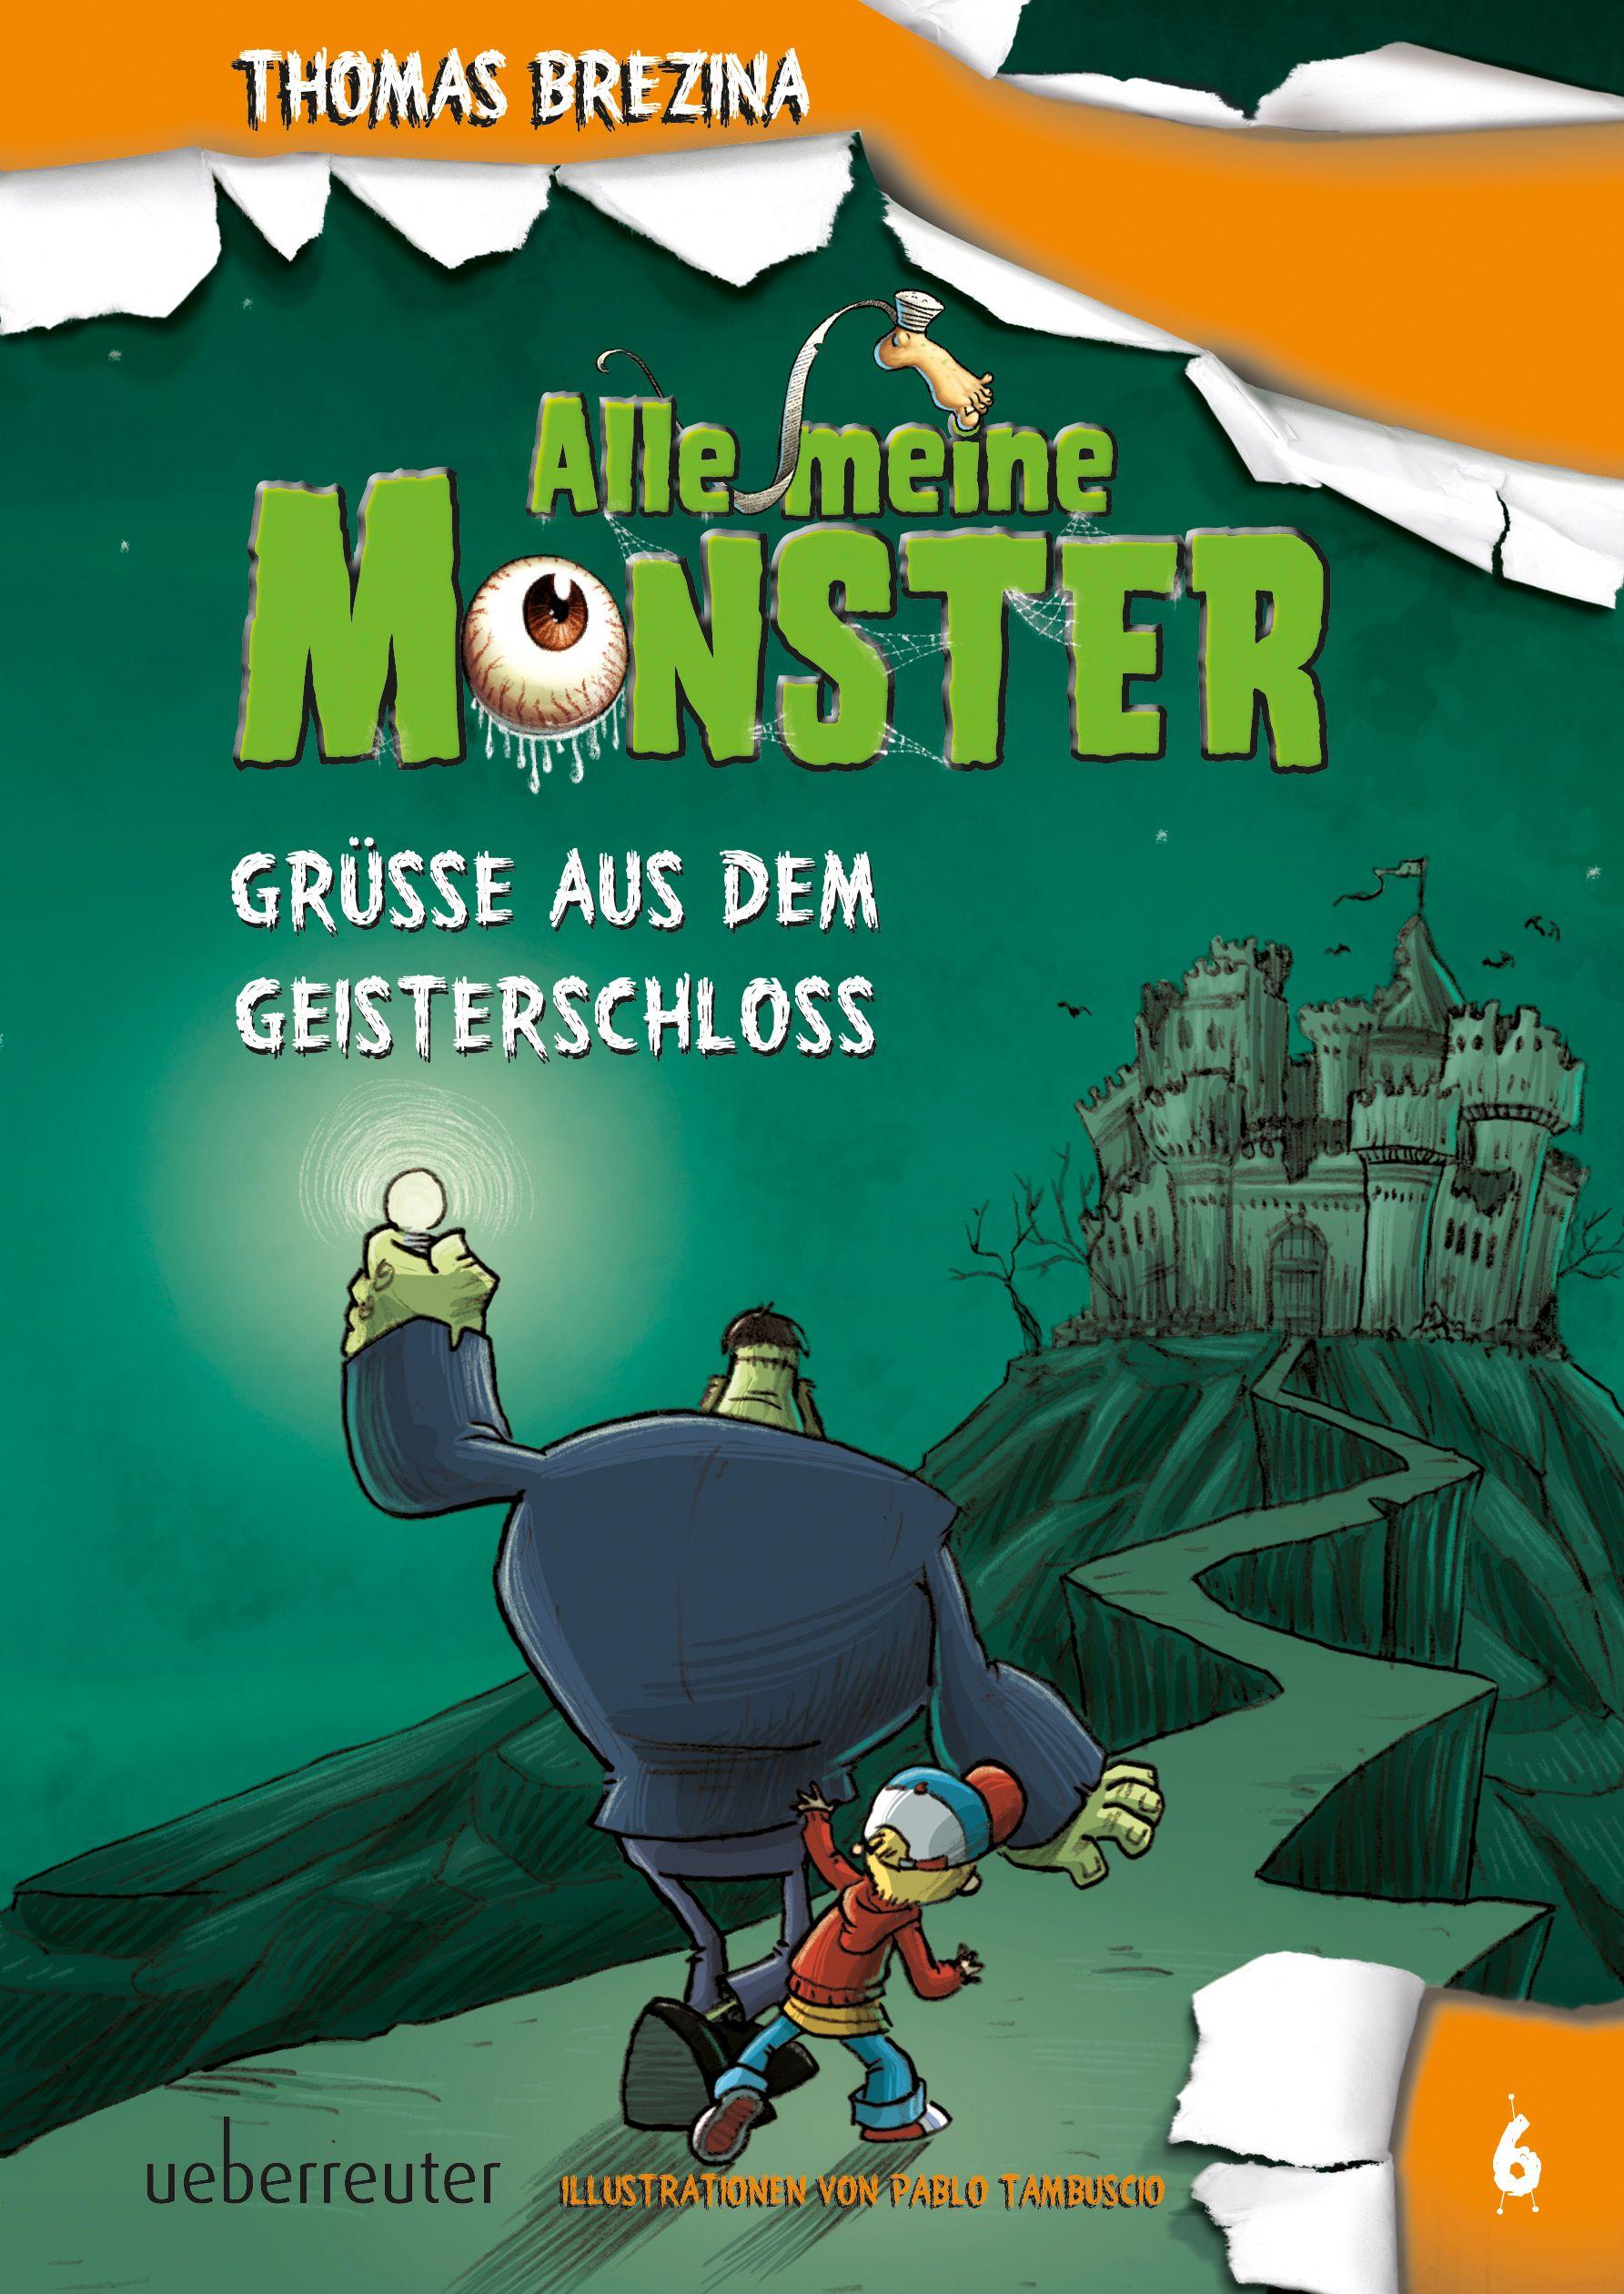 Alle meine Monster - Grüße aus dem Geisterschloss | Ueberreuter